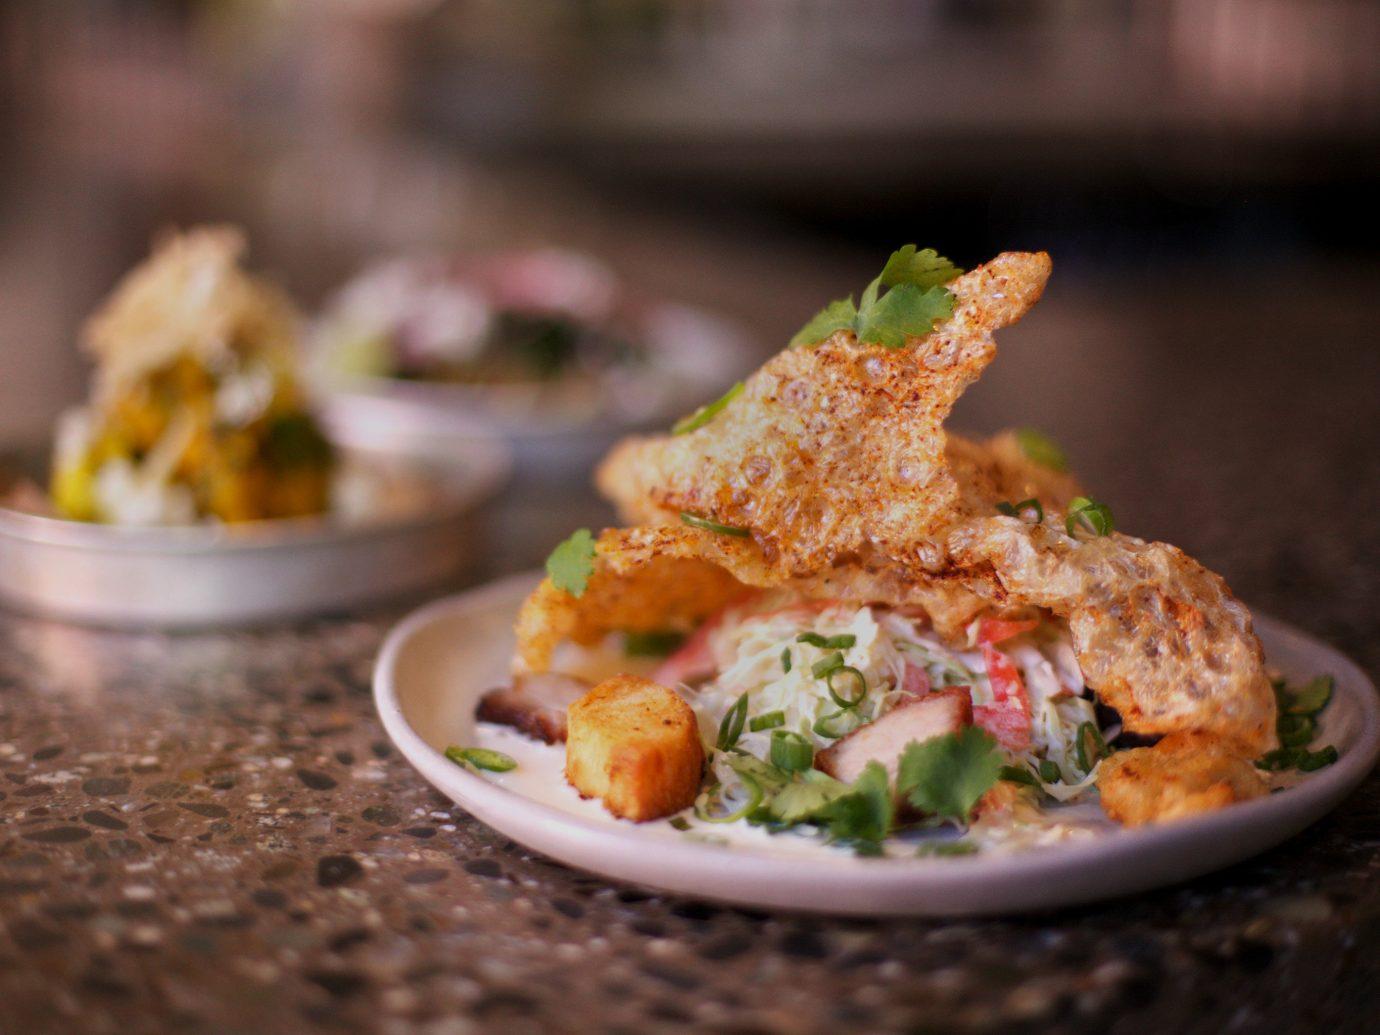 Trip Ideas food dish indoor produce cuisine fried food meal vegetable breakfast close